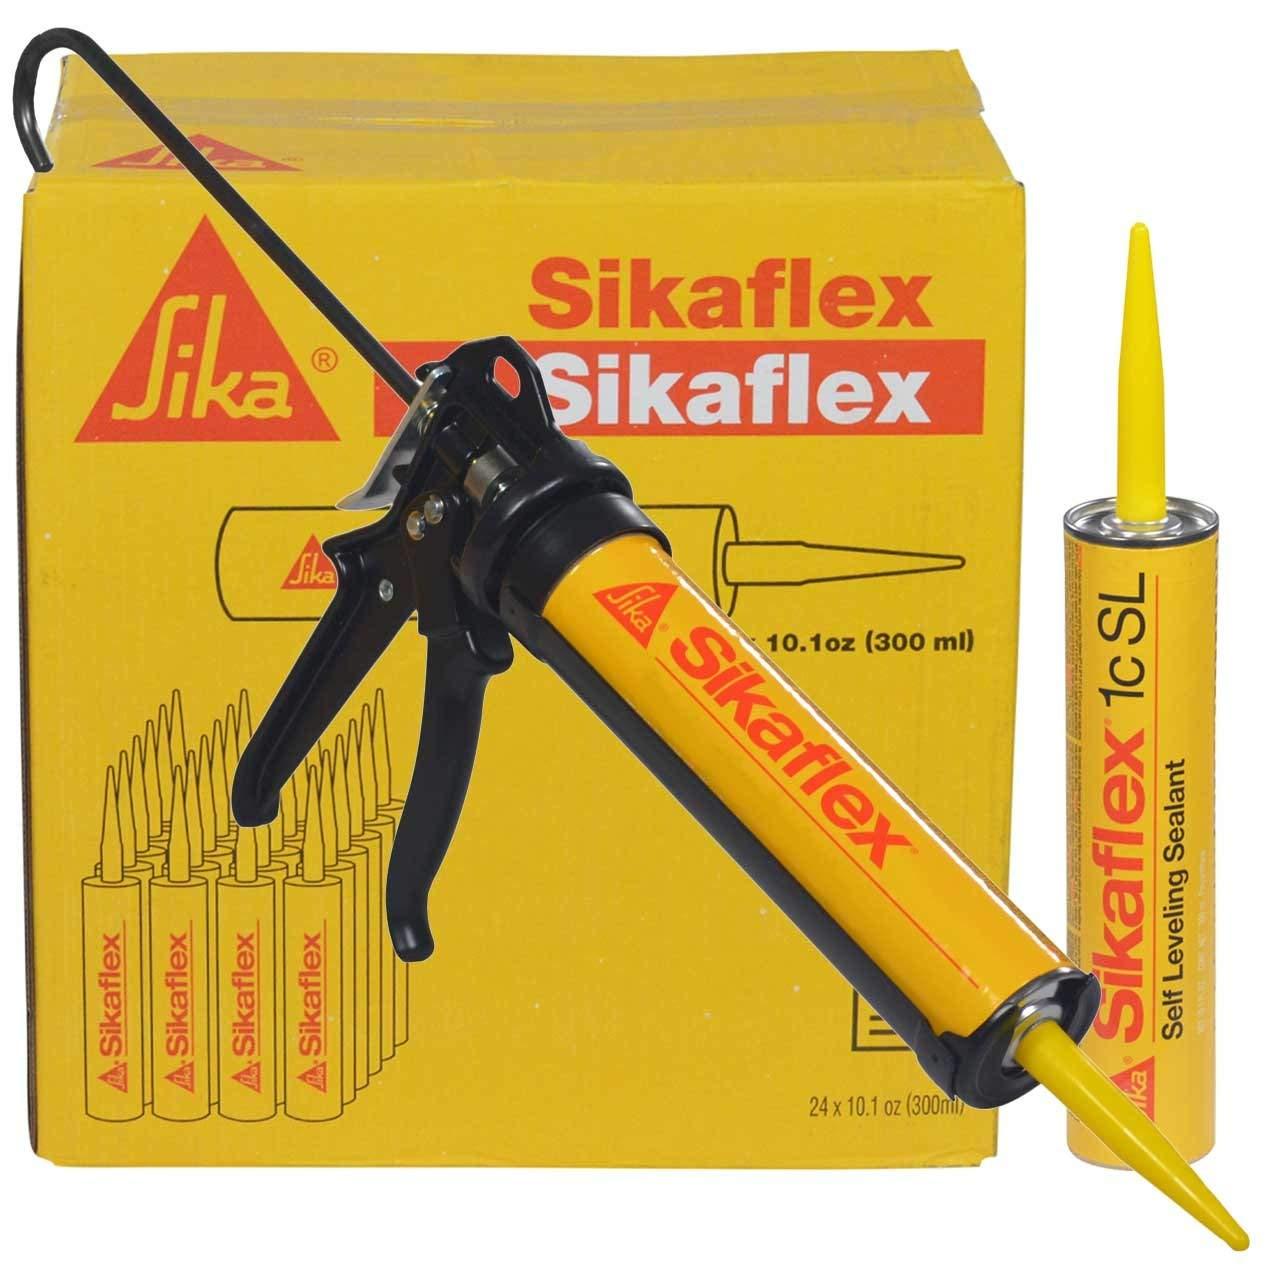 Sikaflex 1C SL 10 oz Limestone Expansion Oklahoma City Mall - Concrete Ranking TOP3 Joint Filler